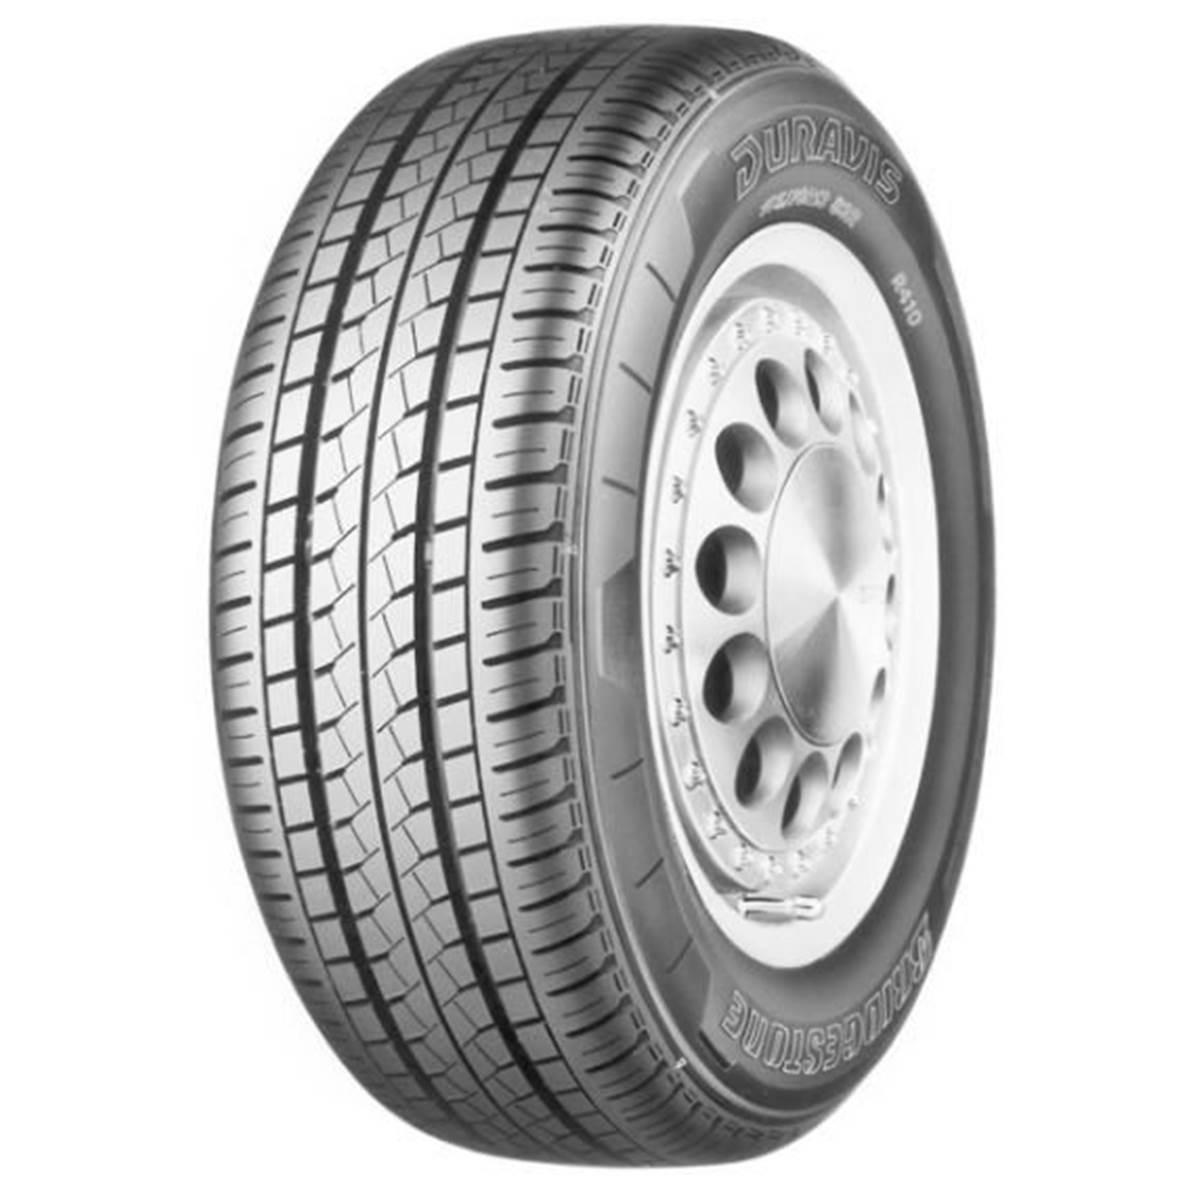 Pneu Bridgestone 165/70R14 85R Duravis R410